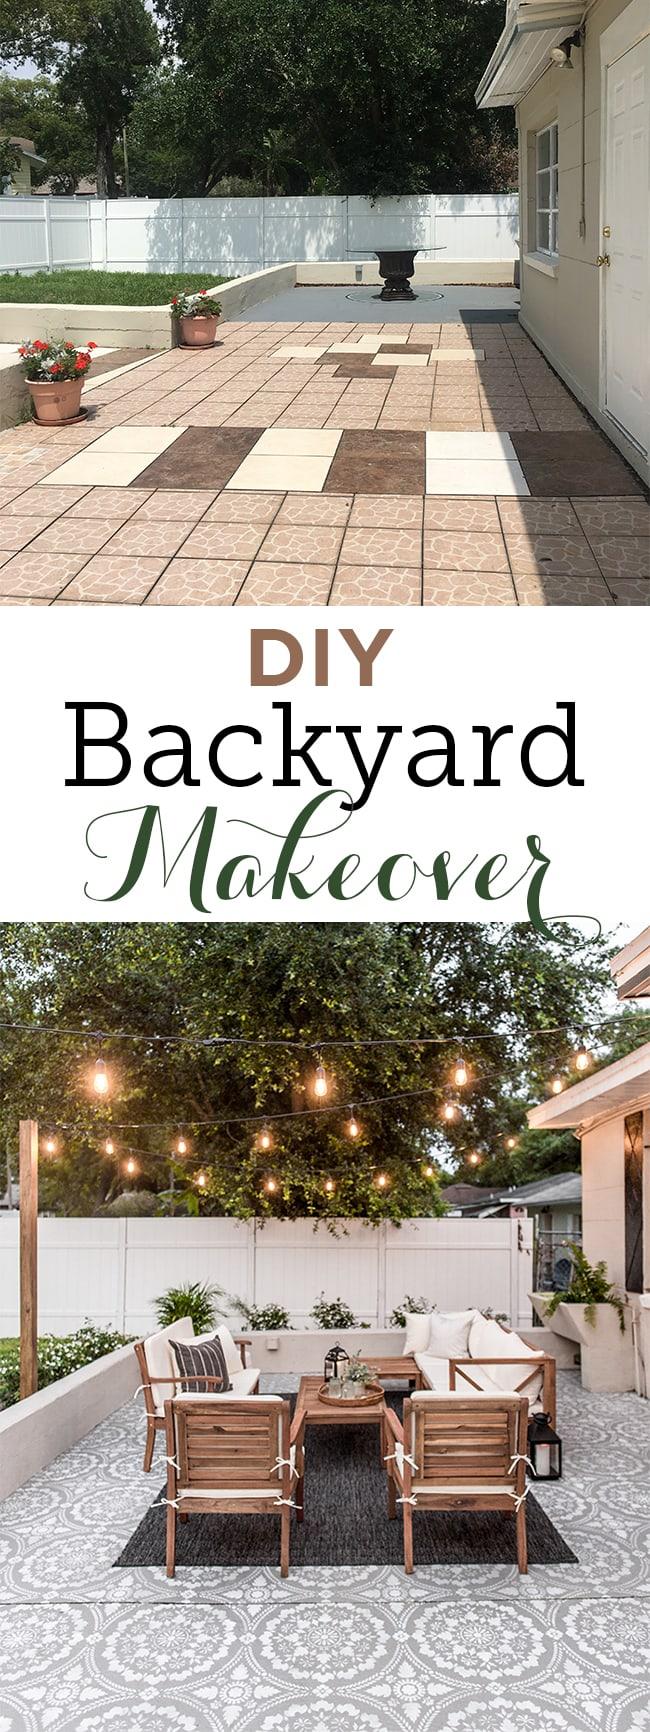 Backyard Makeover Reveal: Riverside Retreat | Jenna Sue Design Blog